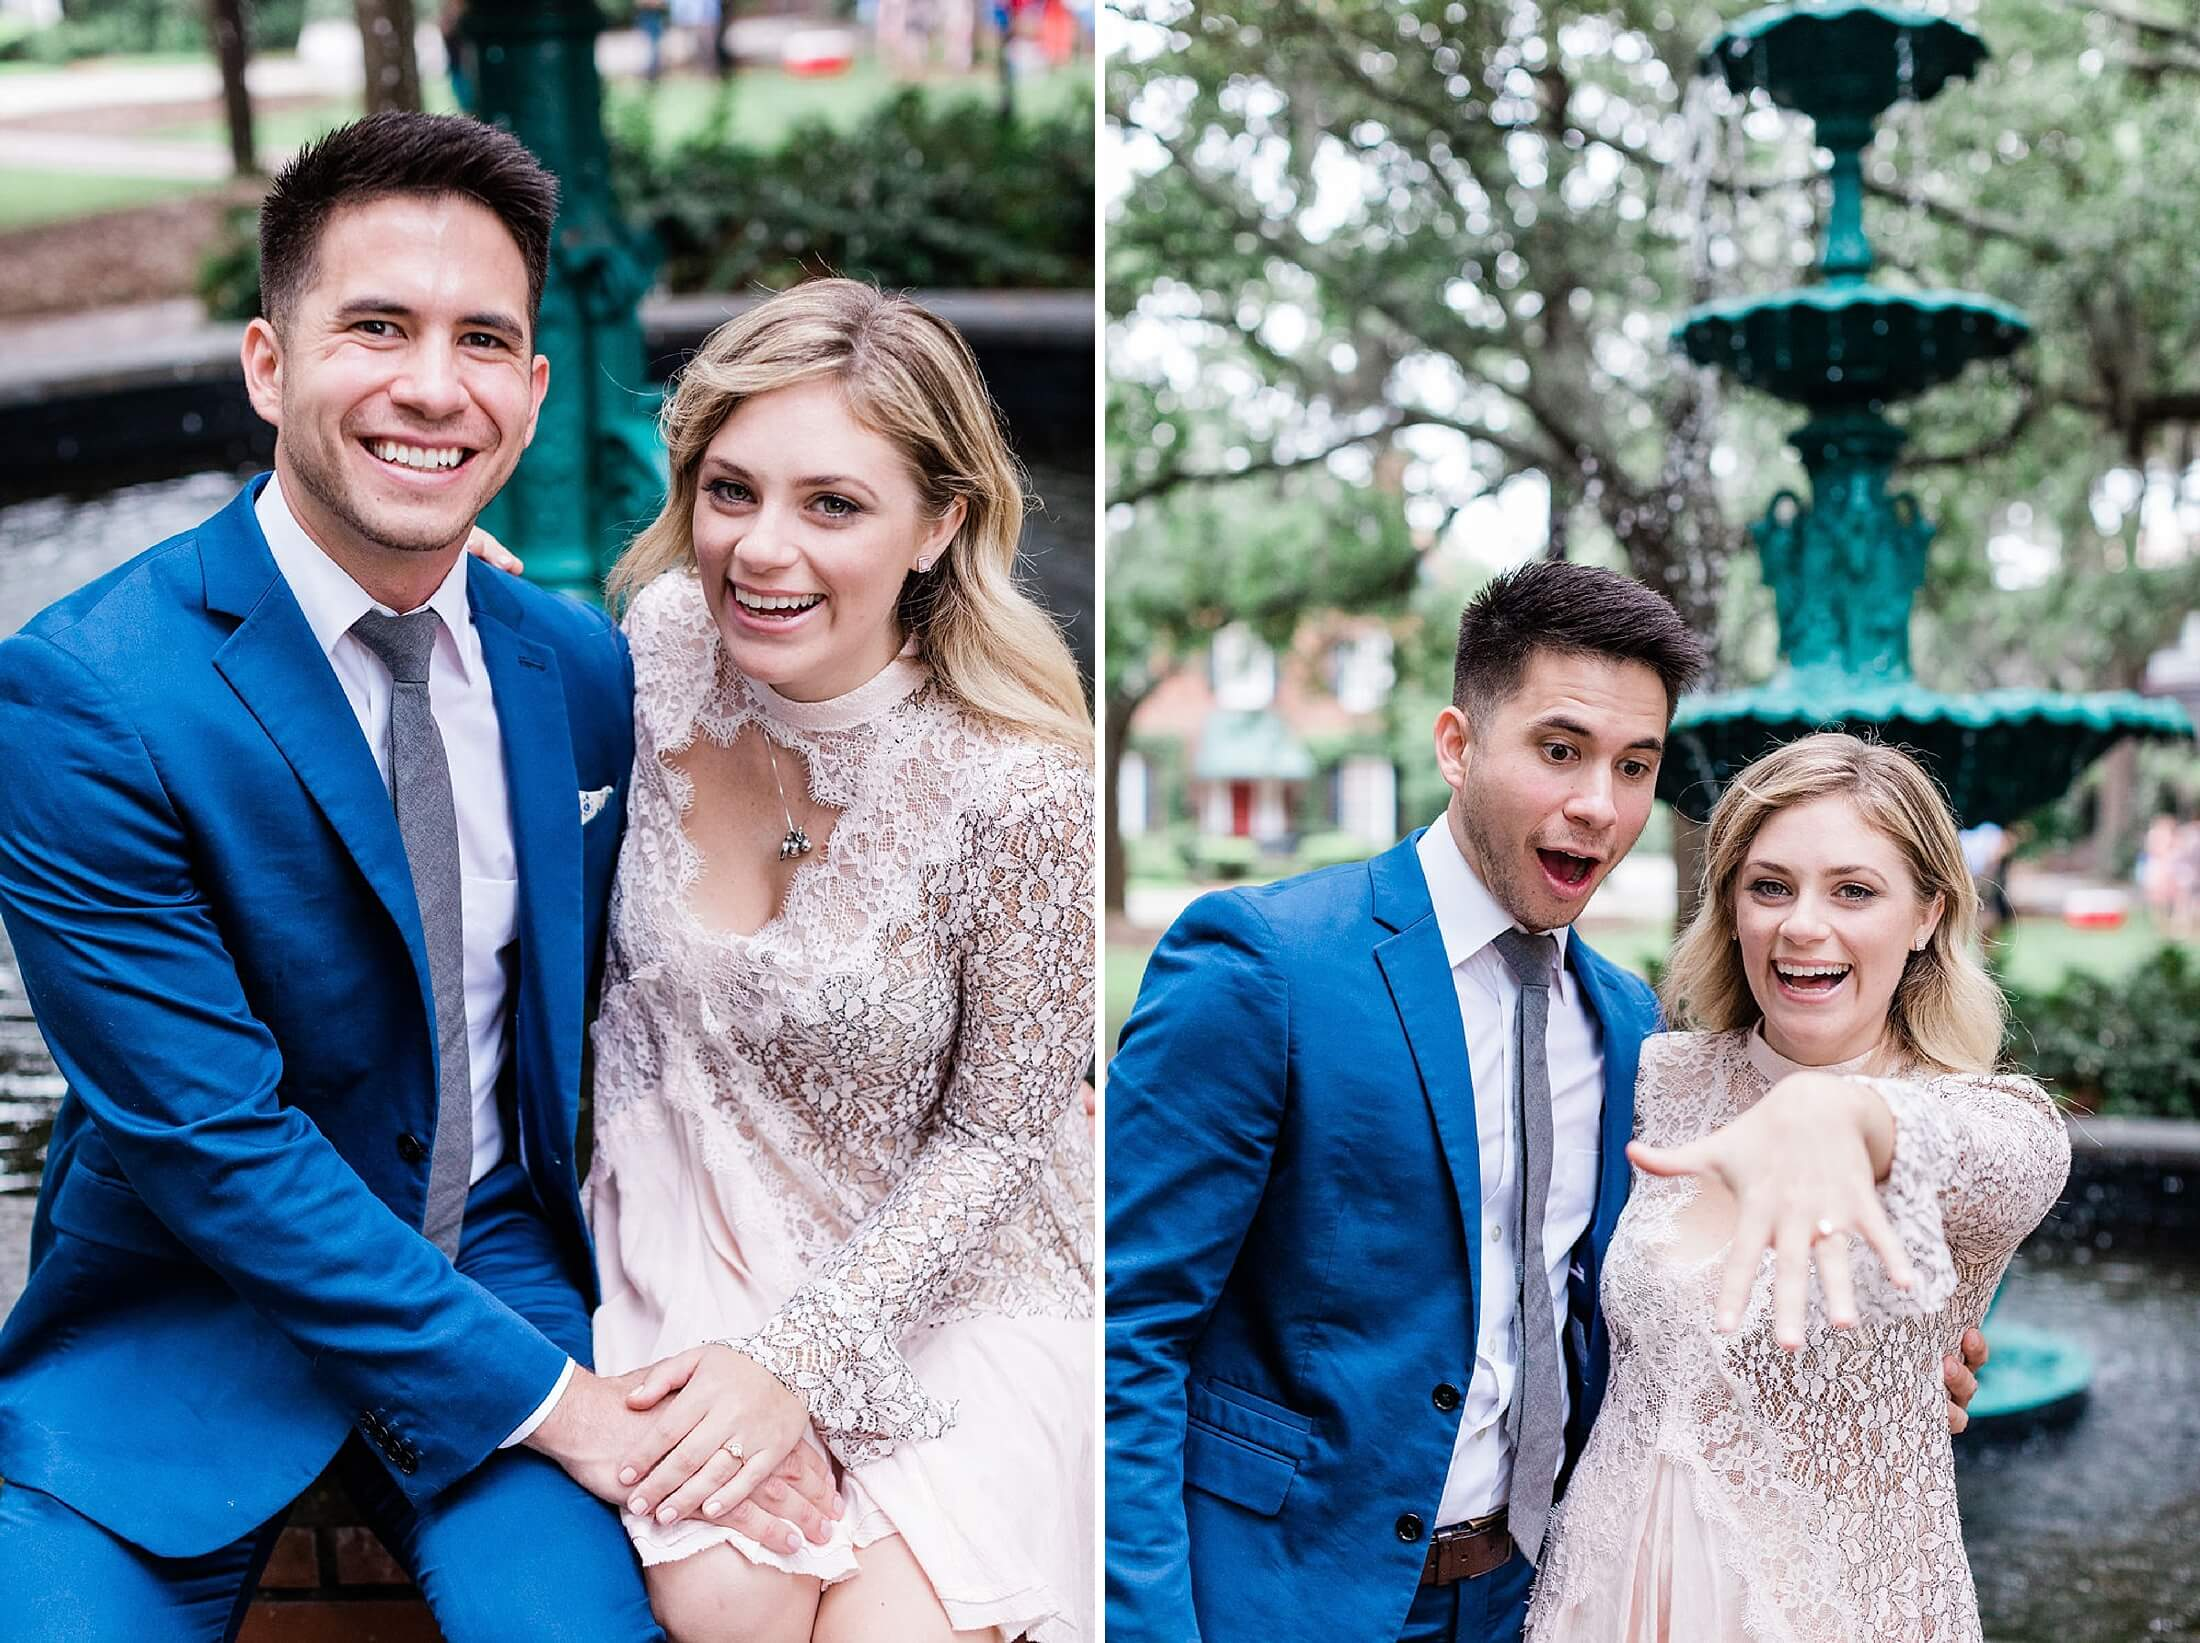 Apt-b-photography-savannah-proposal-photographer-savannah-wedding-photographer-19.jpg